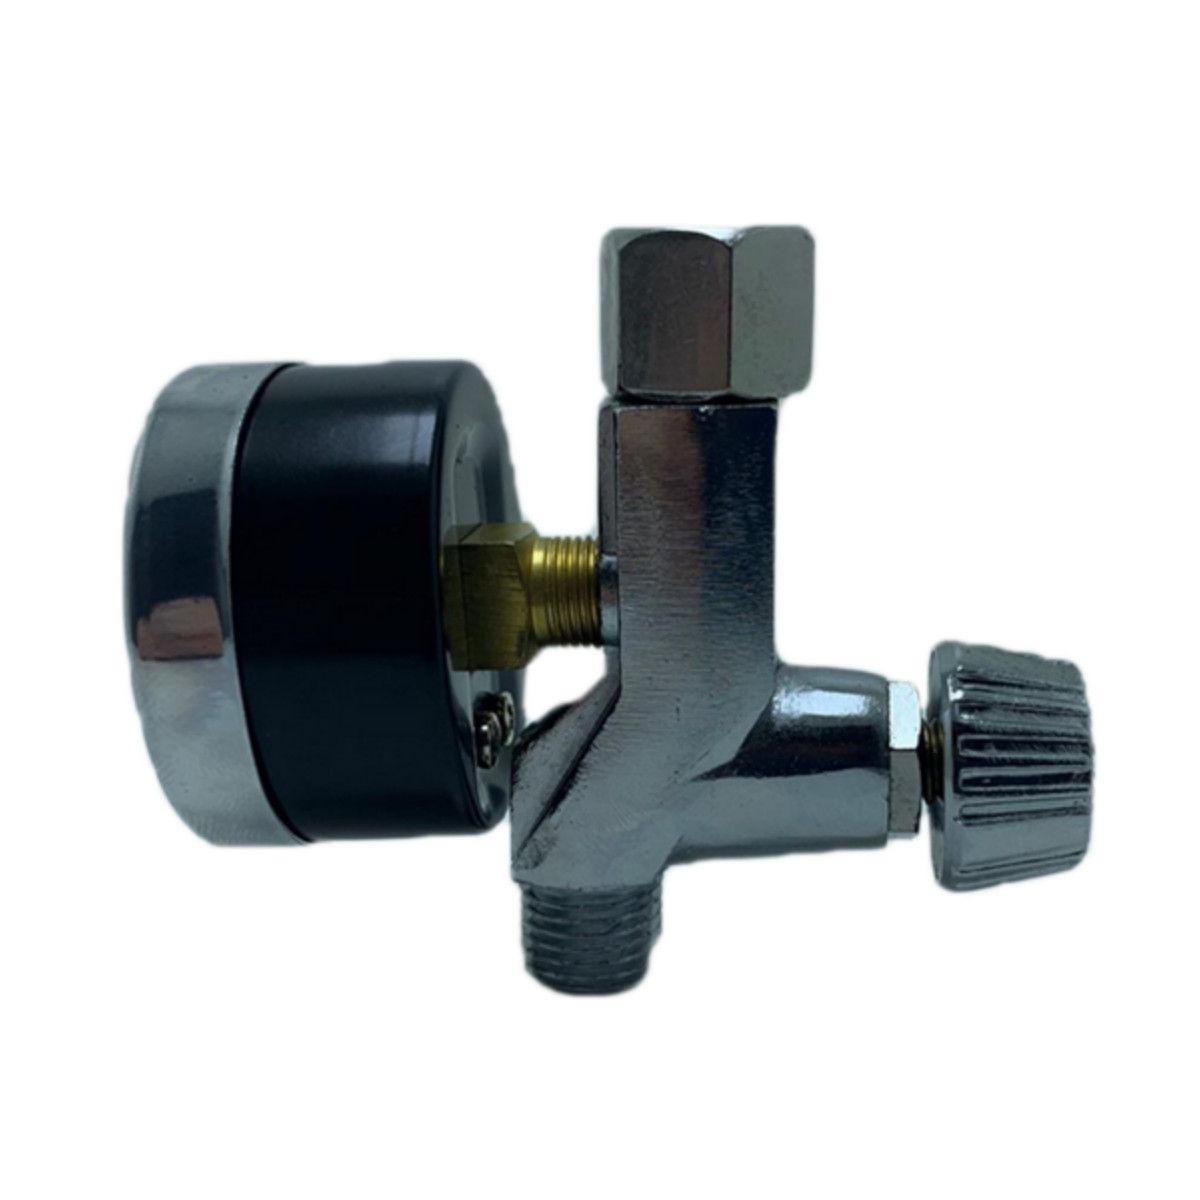 Kit 2 Regulador Válvula Pressão Para Pistola De Pintura Manômetro